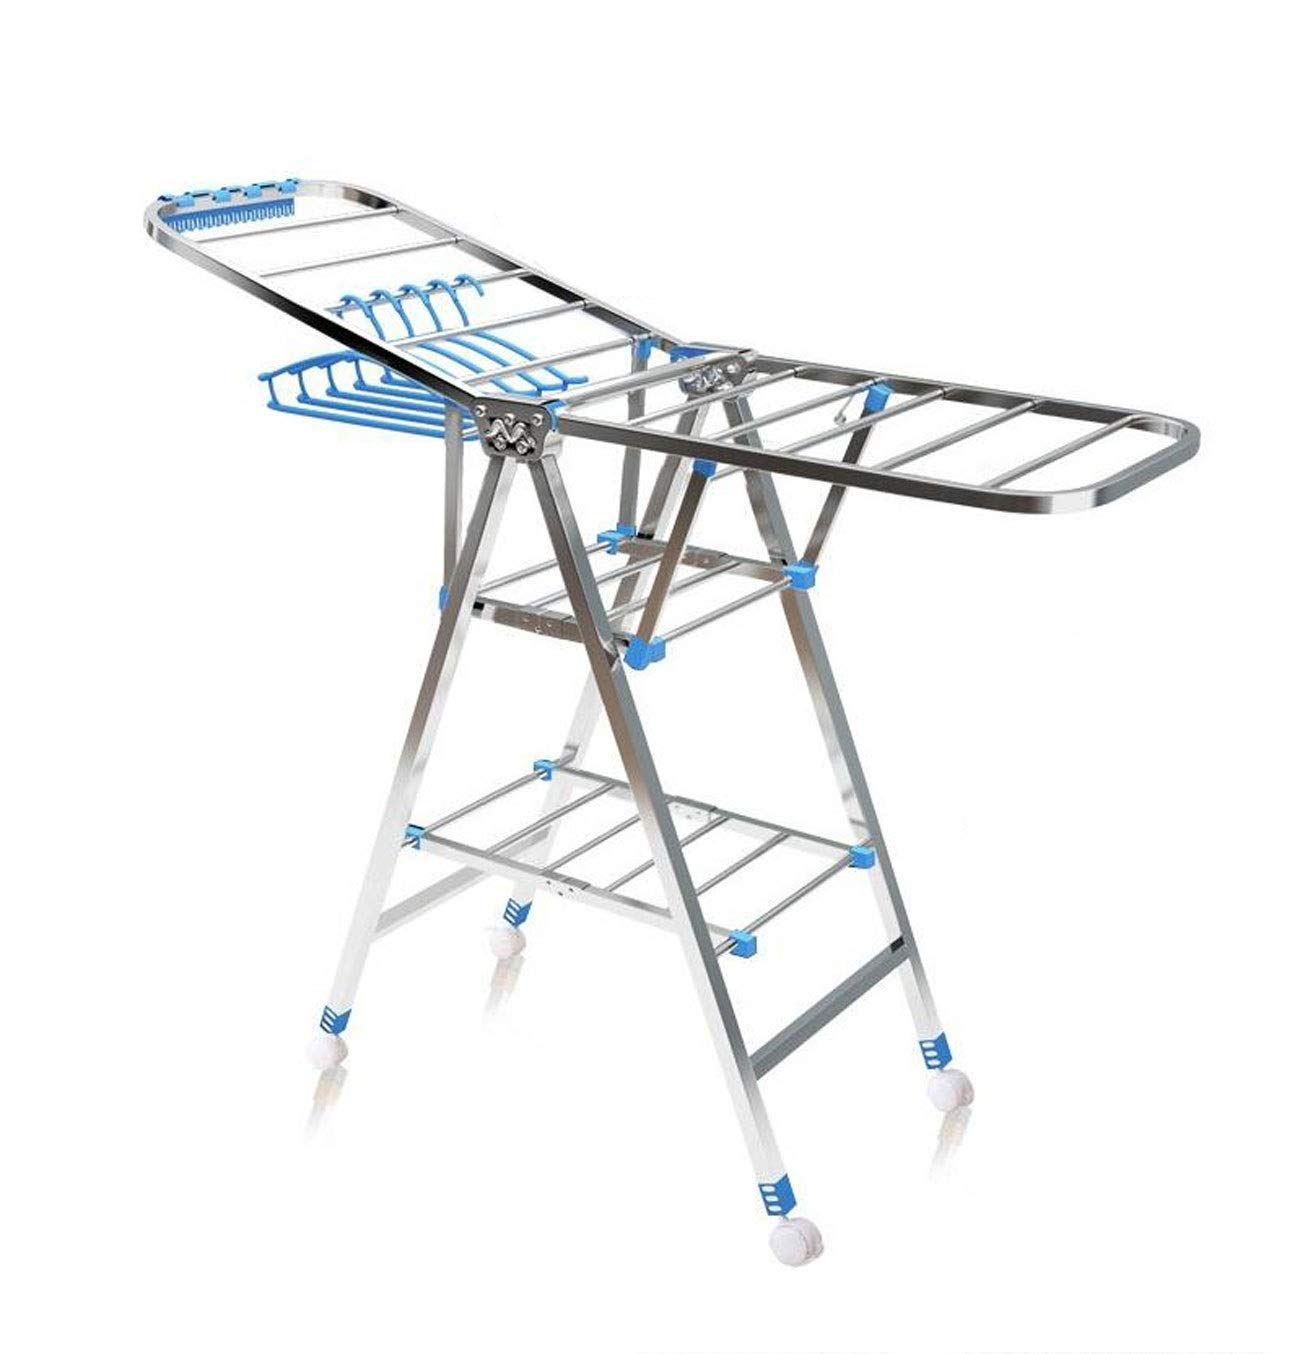 HYZLYJ Drying Rack, Stainless Steel Drying Rack Folding Indoor Hanging Cool Rack Balcony Floor Drying Rack/Floor Dryer